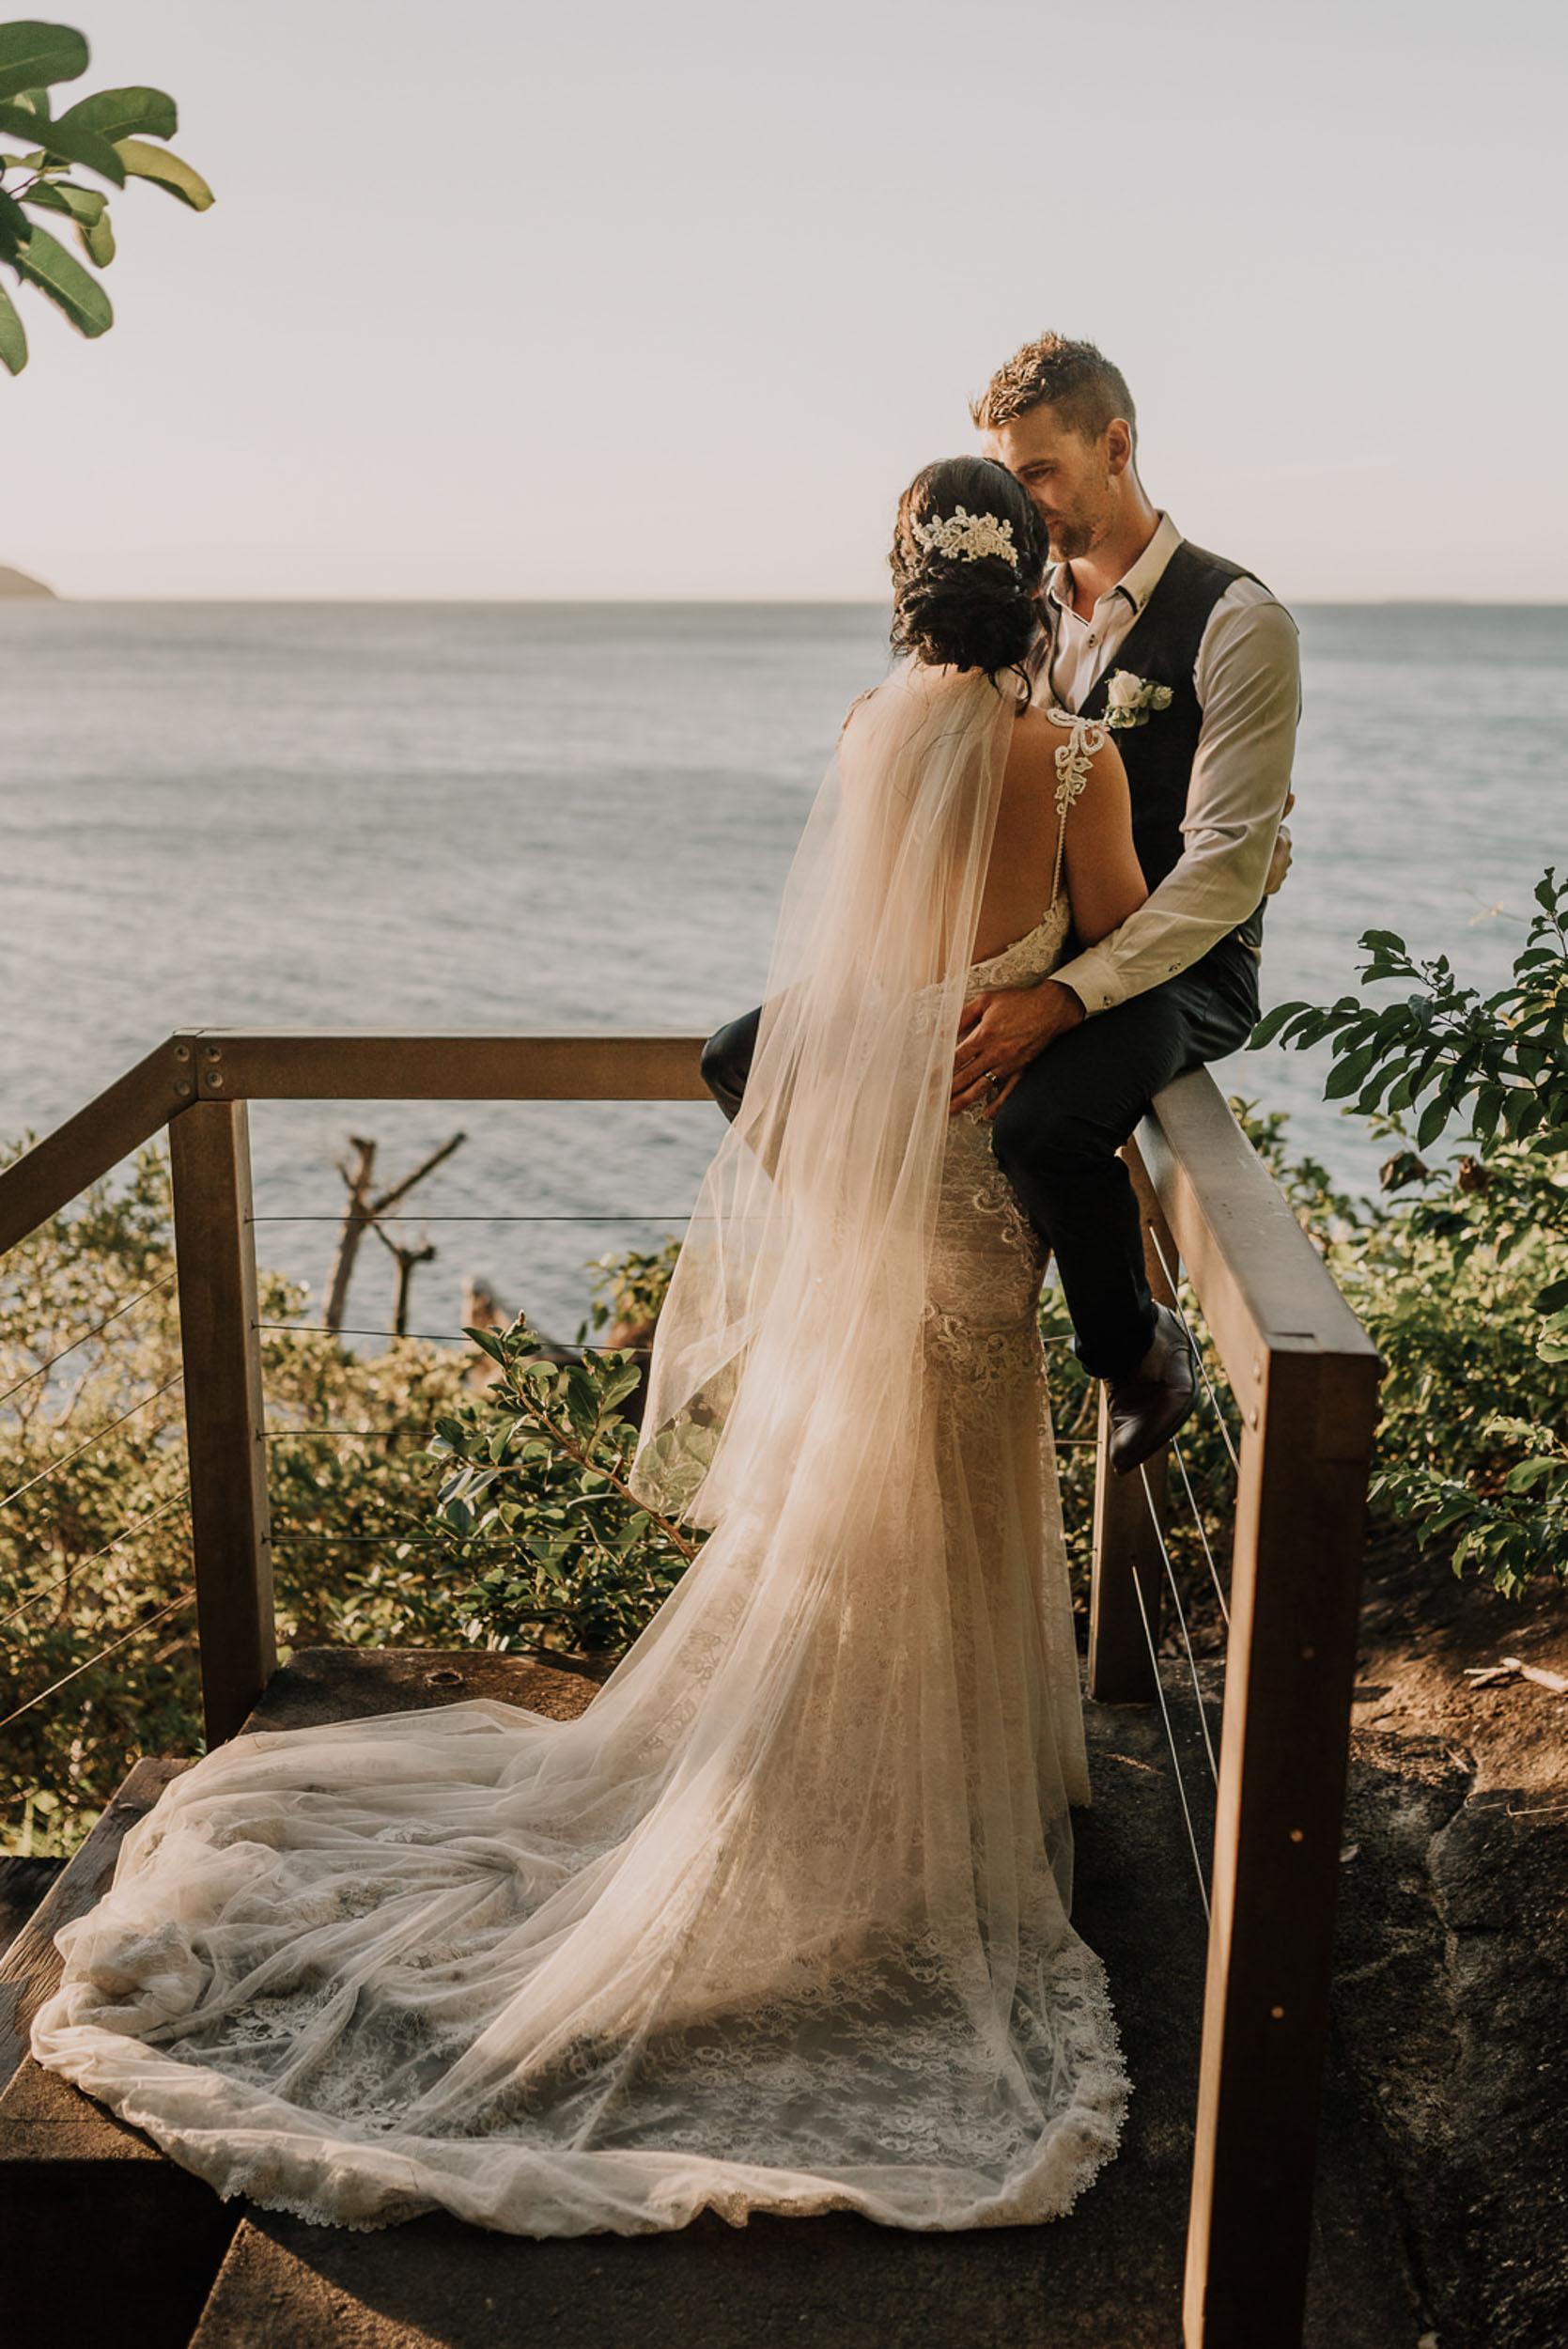 The Raw Photographer - Cairns Wedding Photographer - Fitzroy Island - Destination Wedding - Bride Dress - Groom Portrait - Queensland-32.jpg